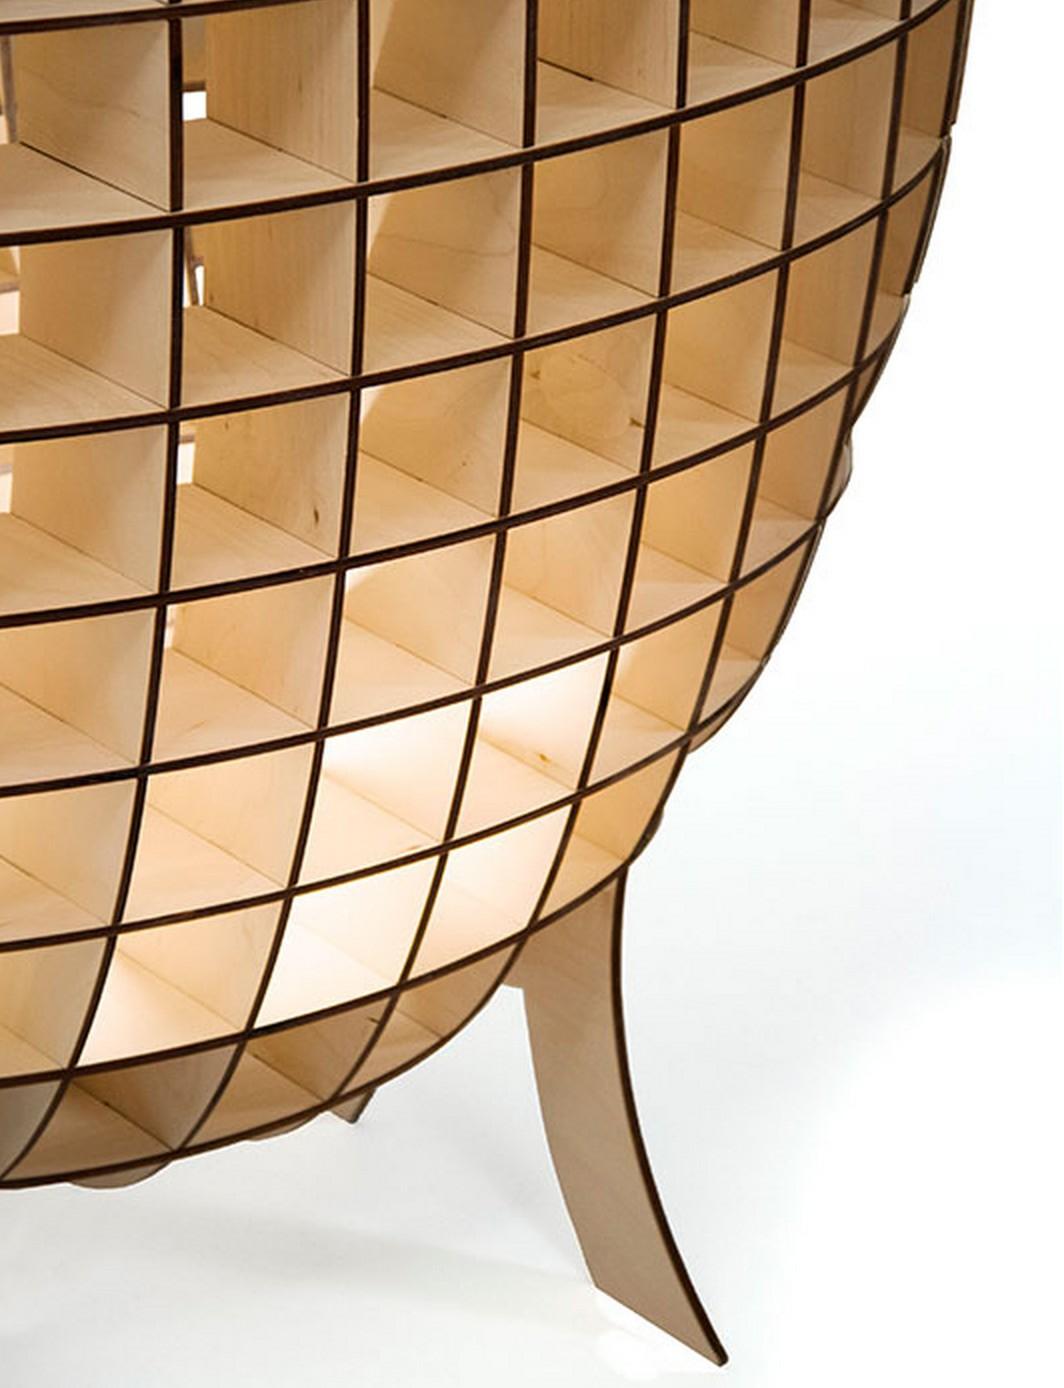 lampe lampyridae par monica correia blog d co design. Black Bedroom Furniture Sets. Home Design Ideas